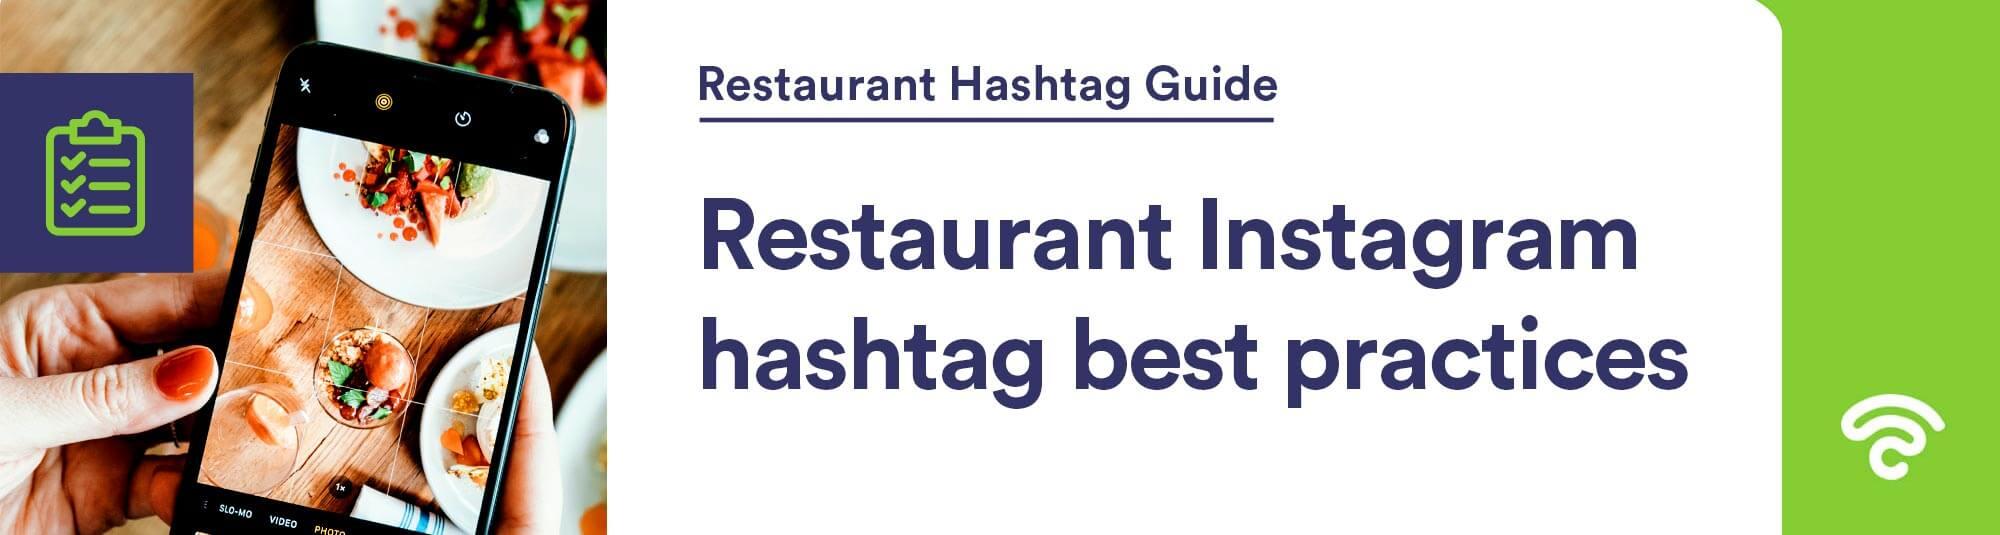 restaurant hashtag best practices